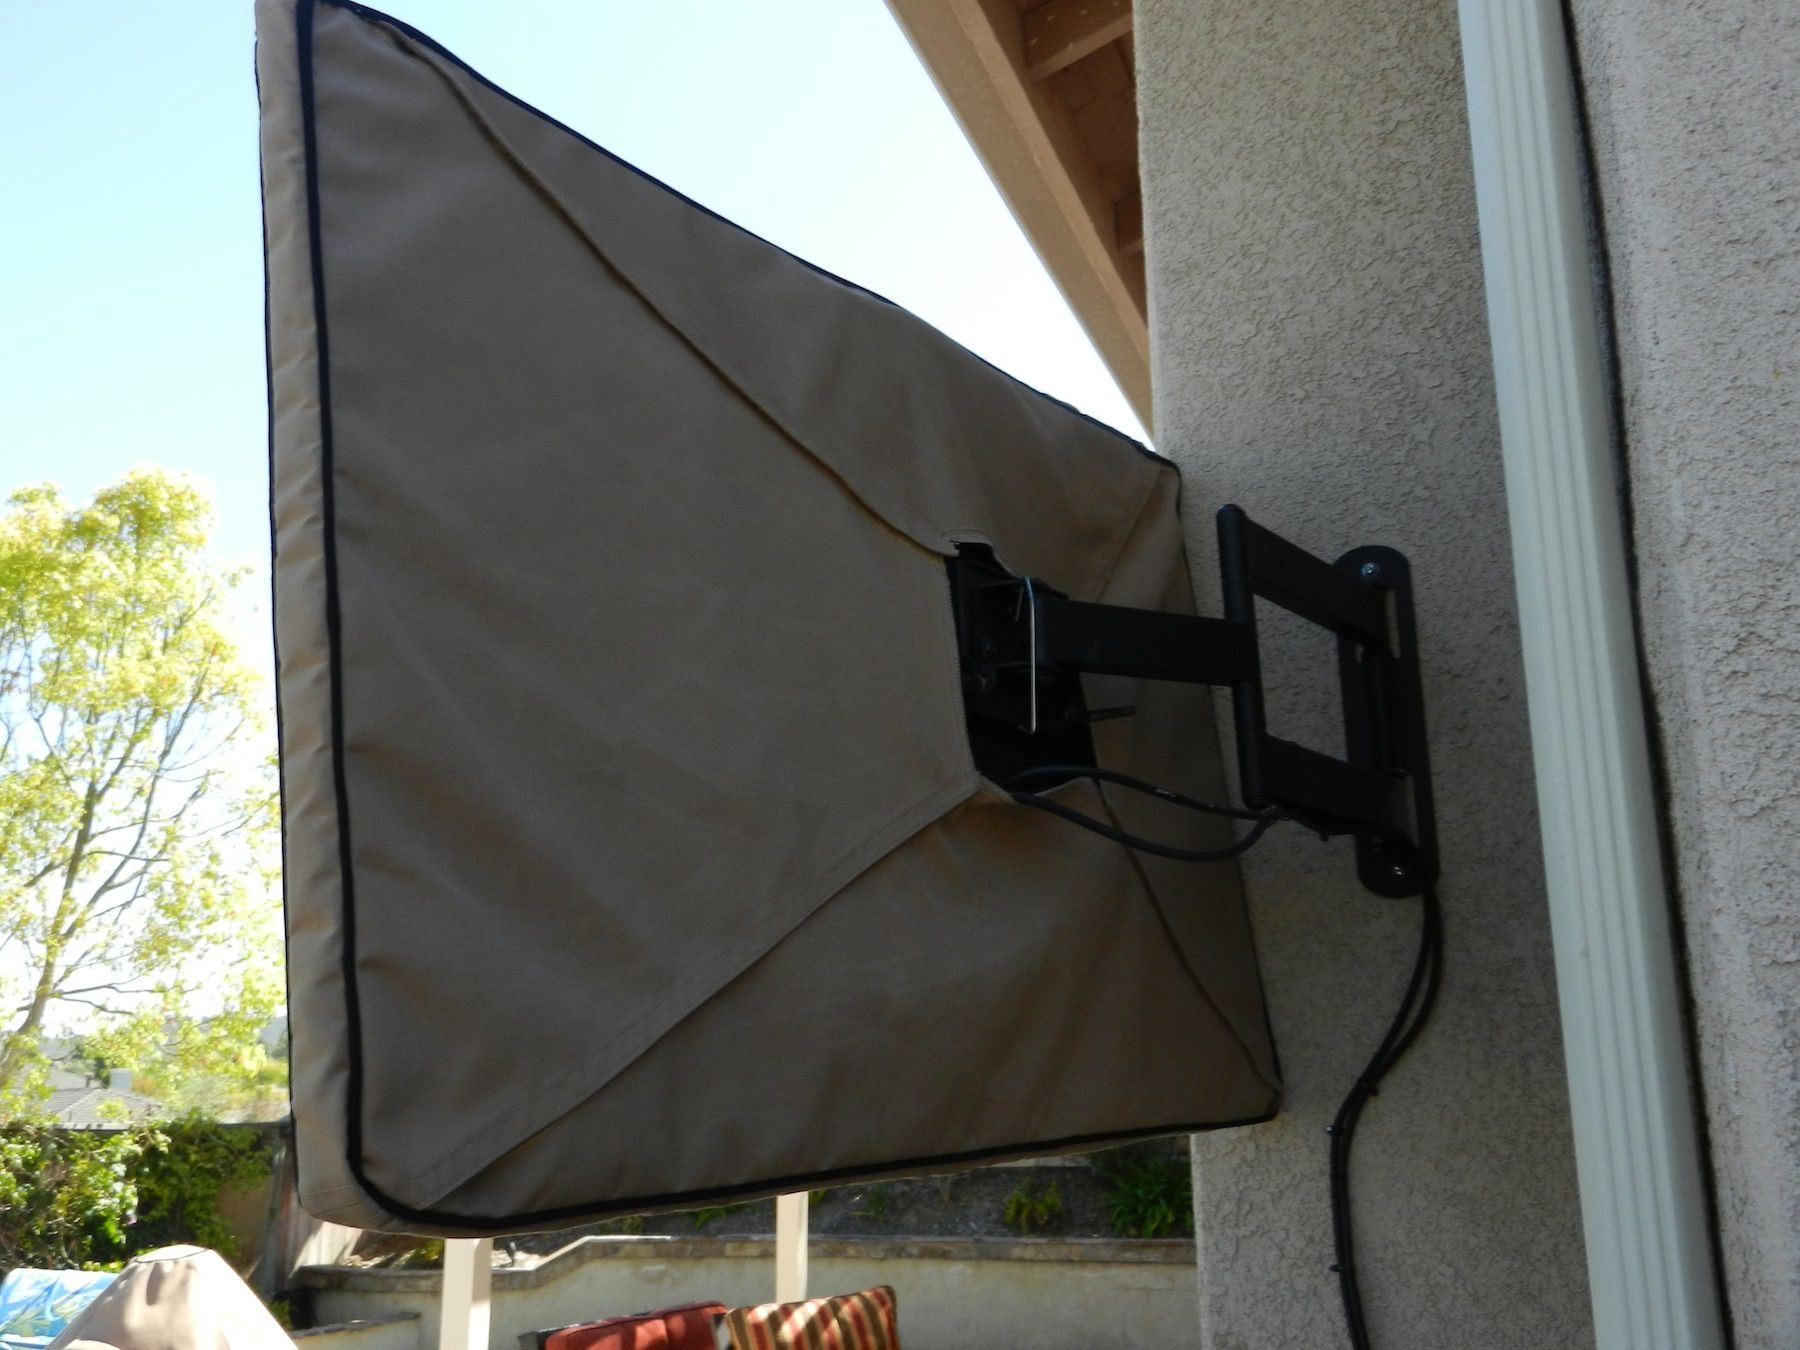 Waterproof Outdoor Tv Cover Covers